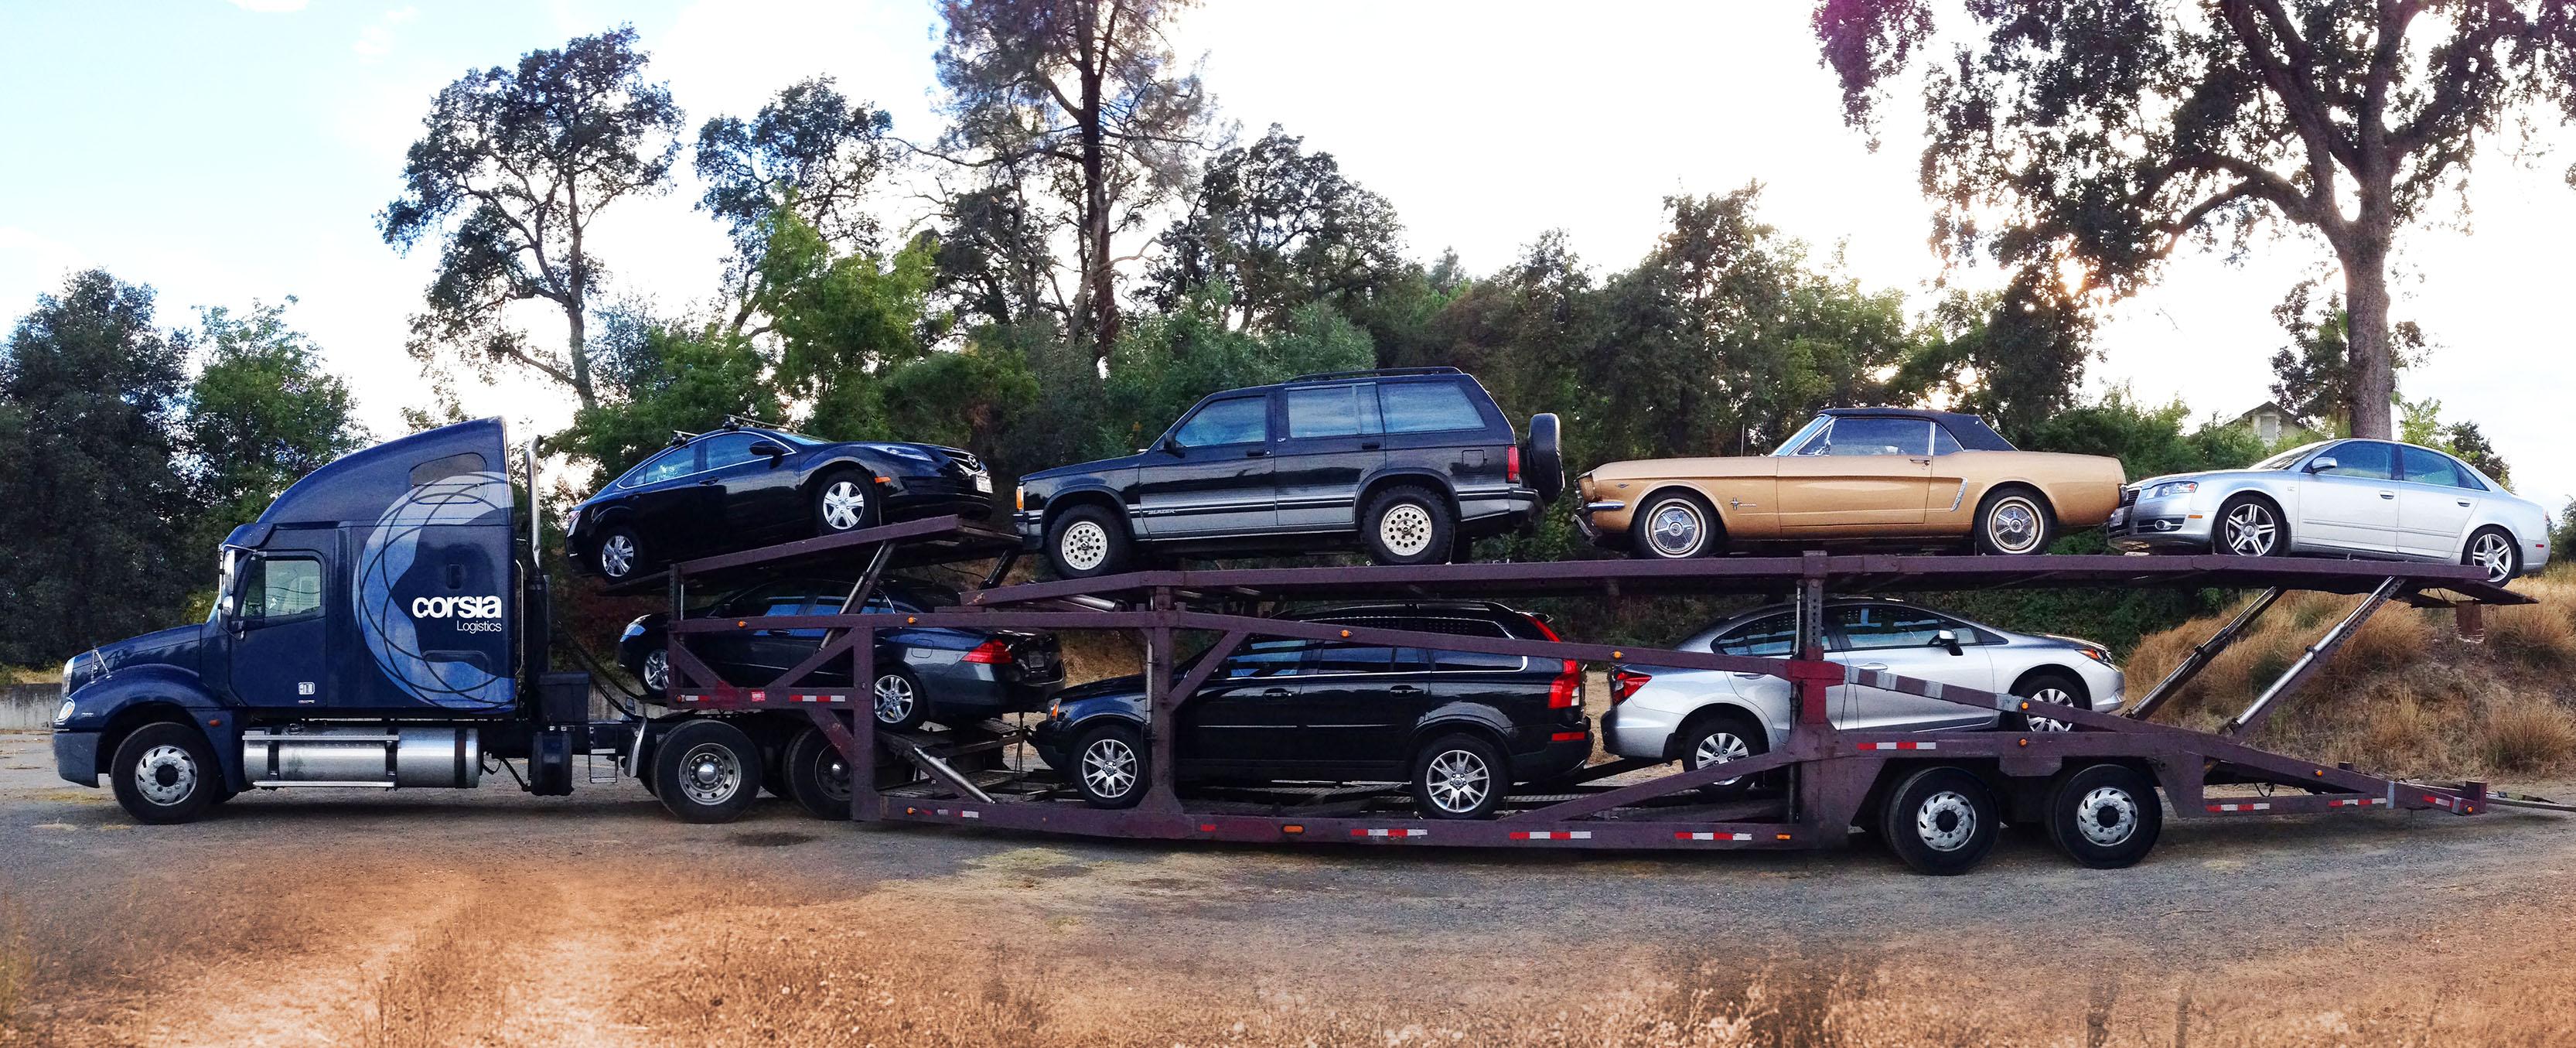 Standards to Follow When Choosing a Car Shipper